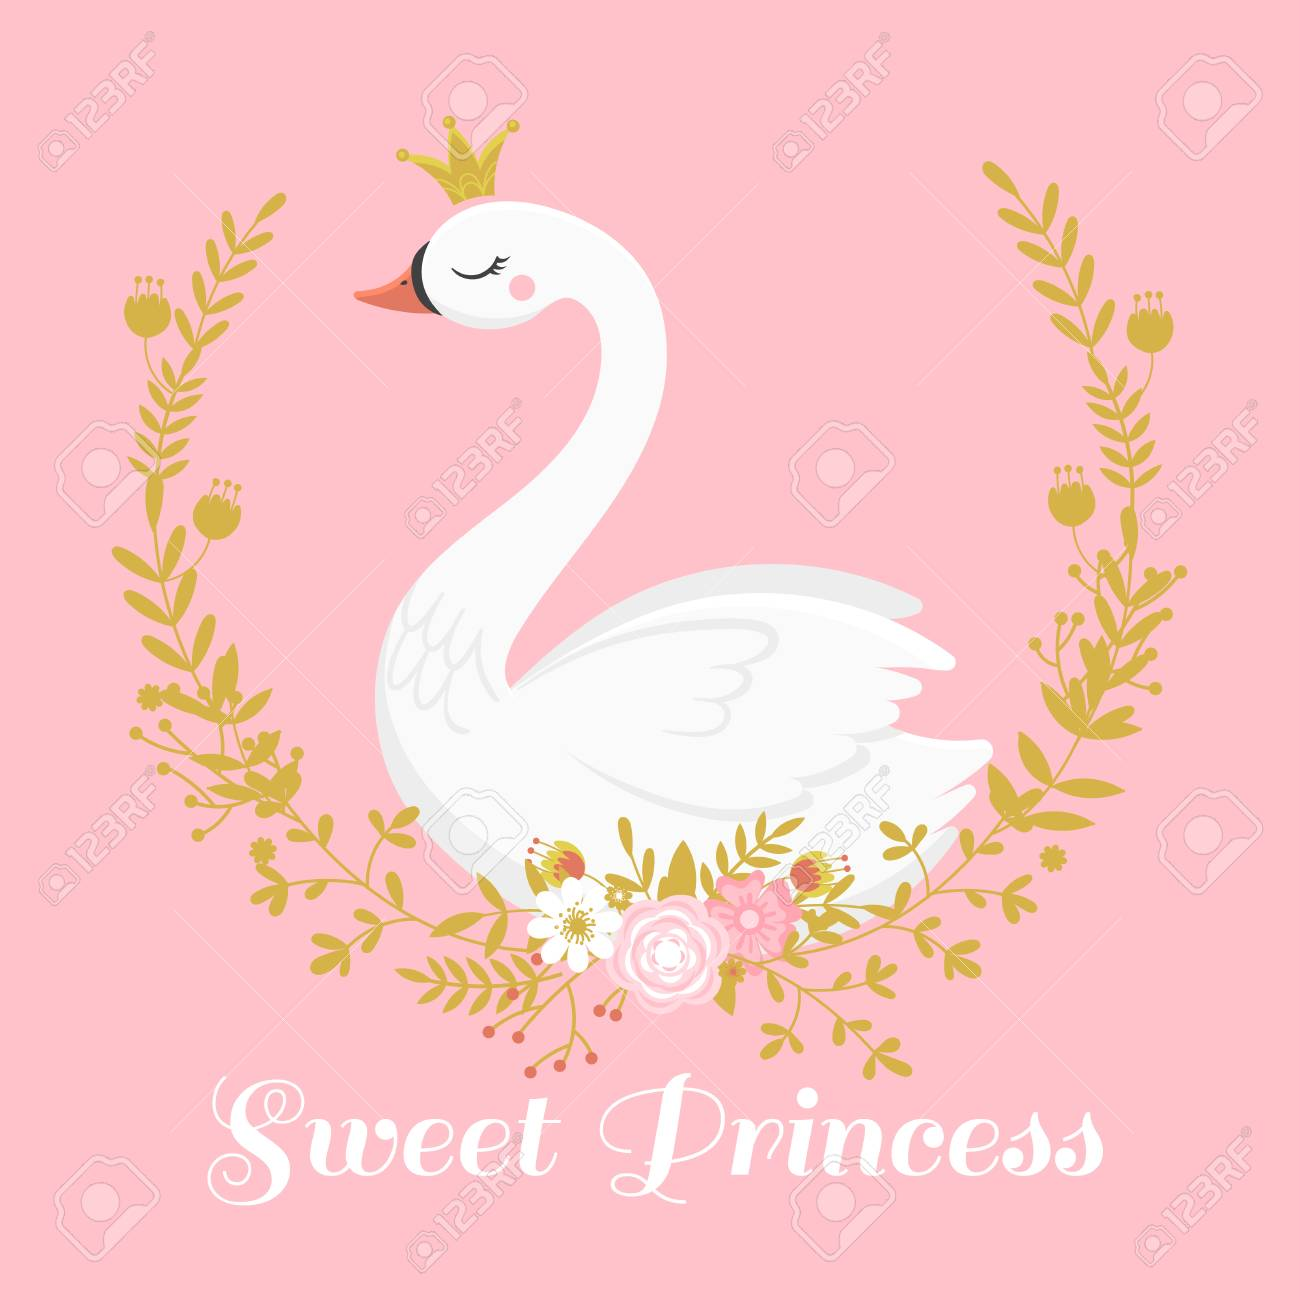 Cute Swan Princess Beautiful Lake Swans Bird In Golden Crown